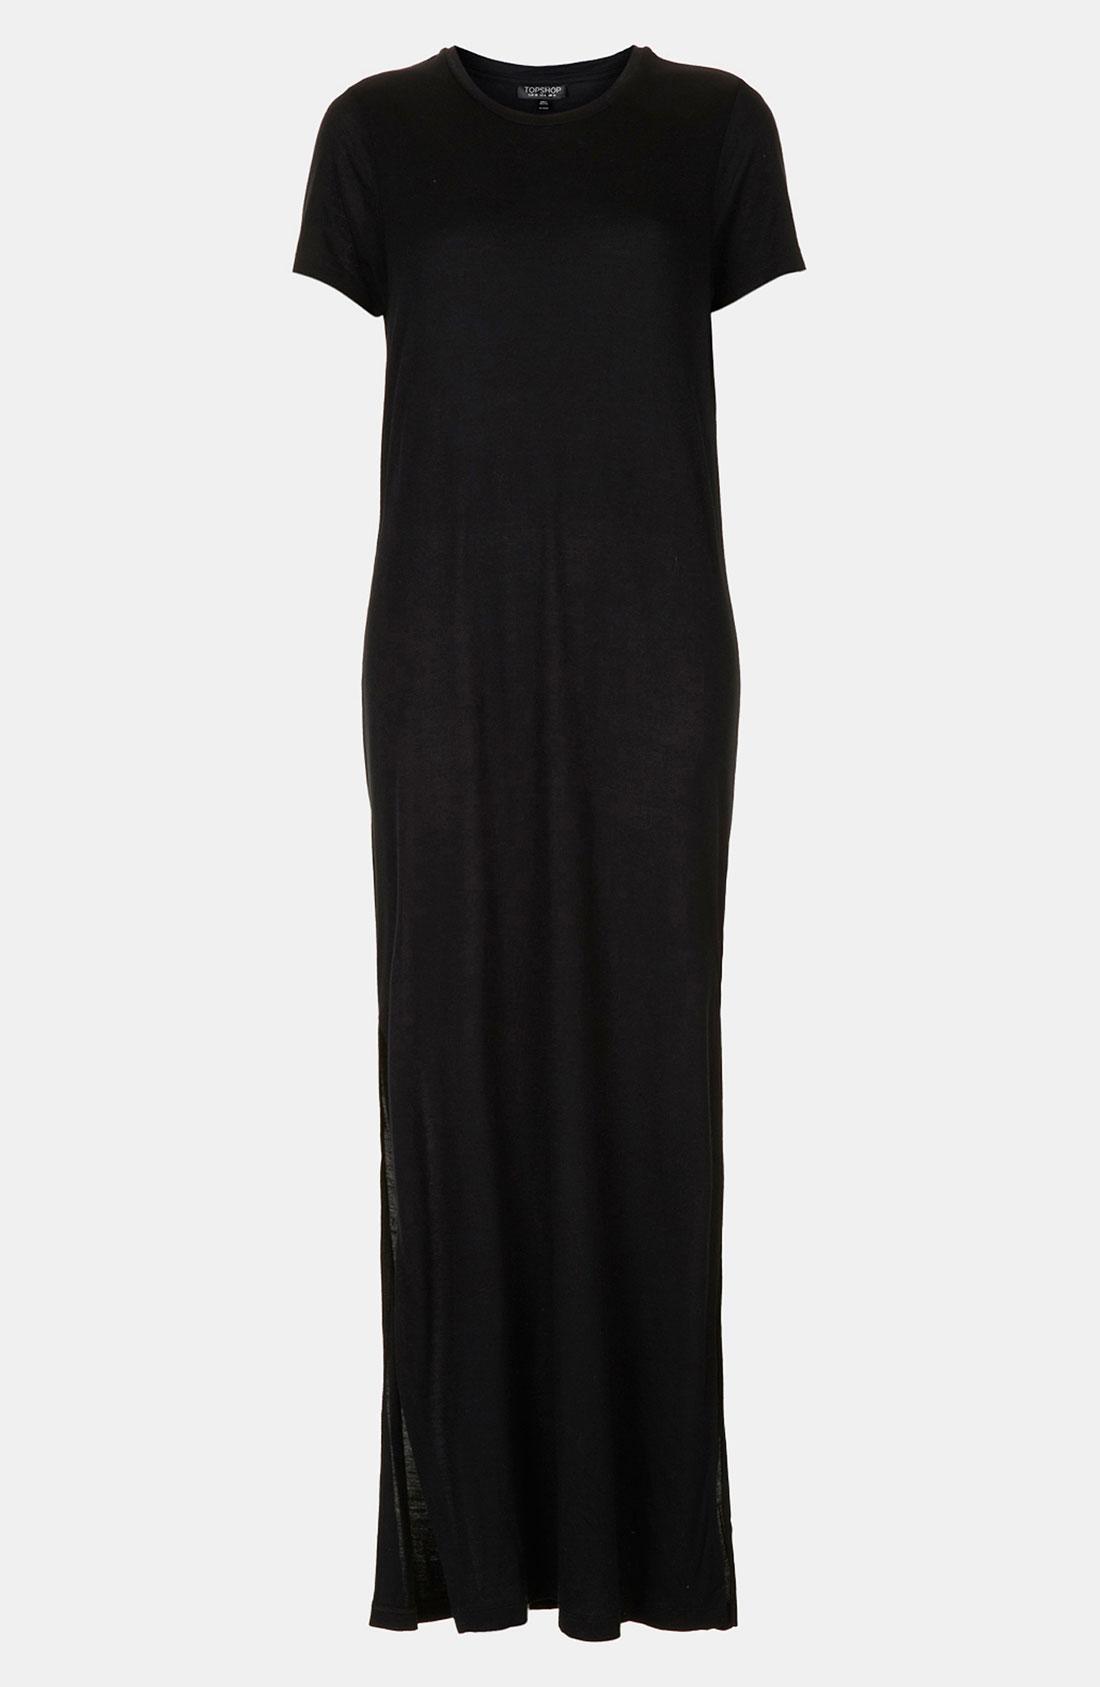 Topshop Side Split Tee Maxi Dress In Black Lyst